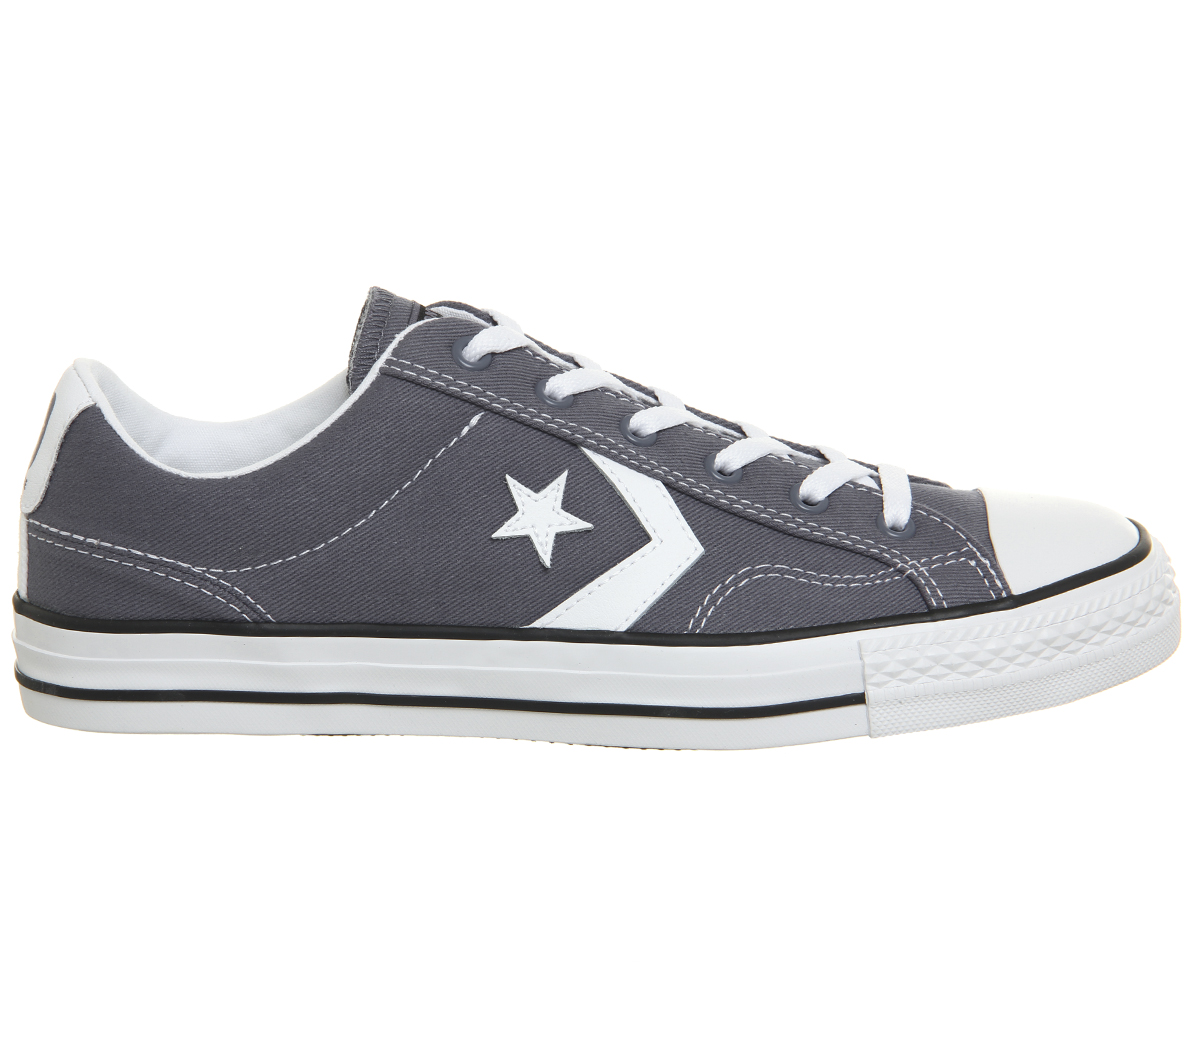 Converse Star Kohlen Spieler Ox Sportschuhe Hell Kohlen Star Weiß Turn Schuhe 6d6388